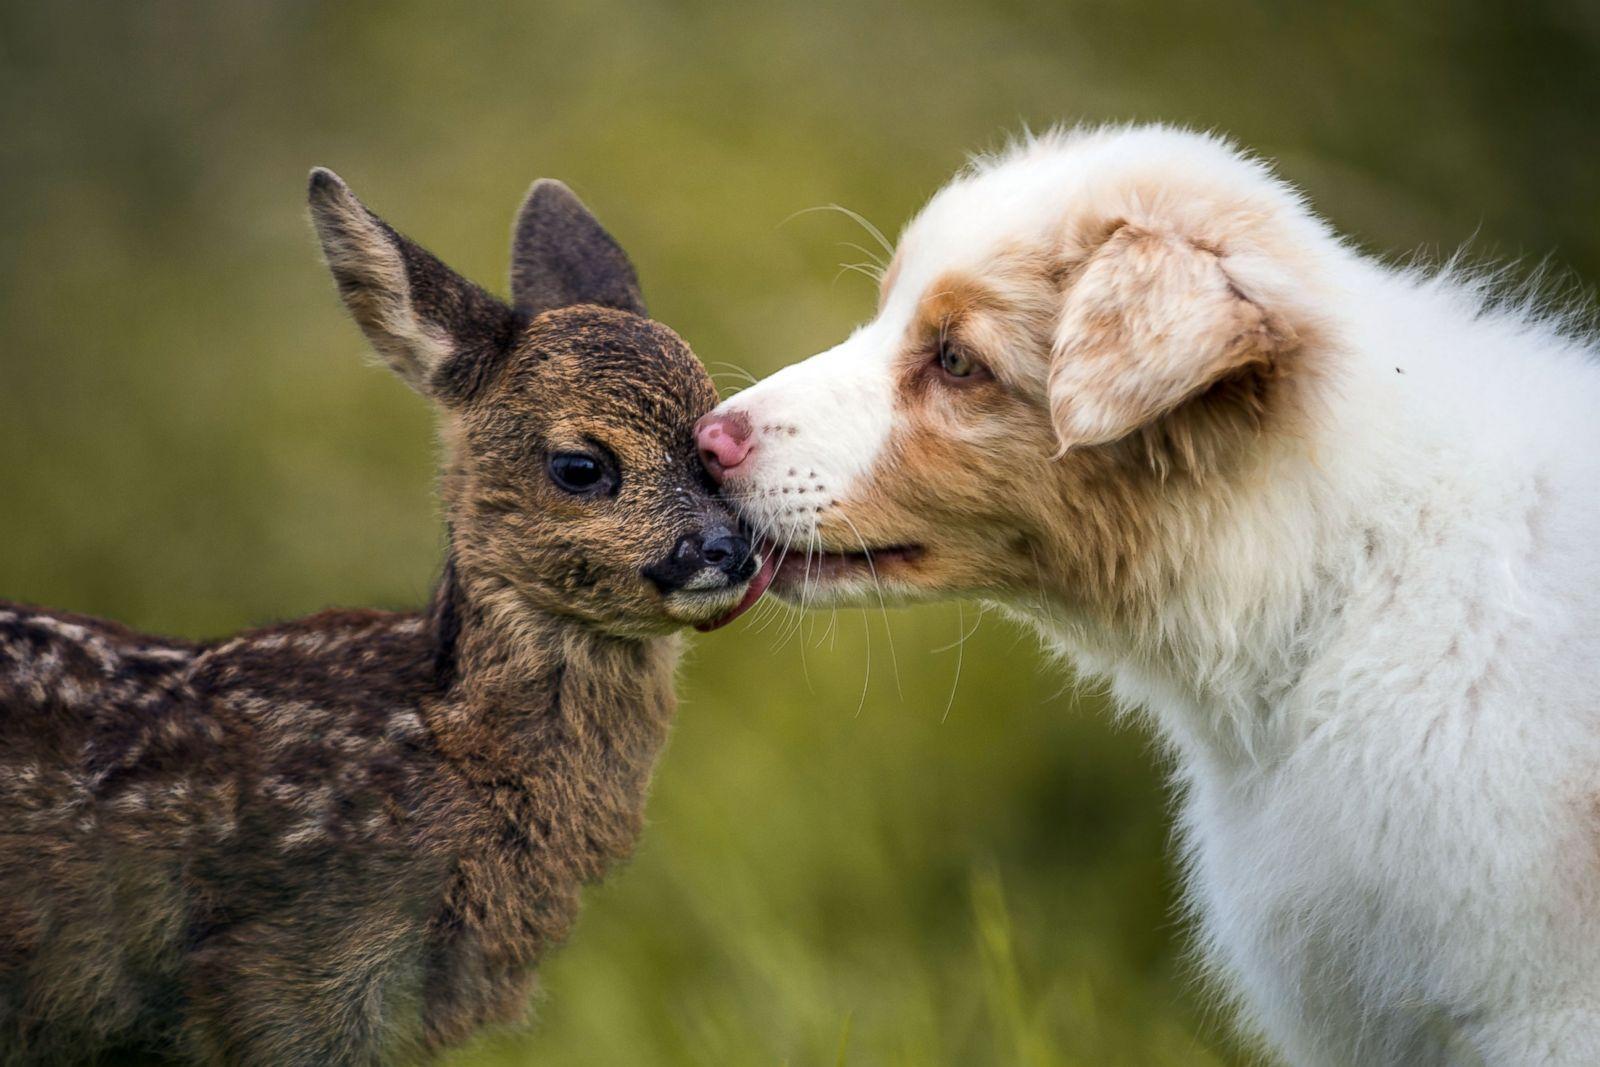 Happy cute animals